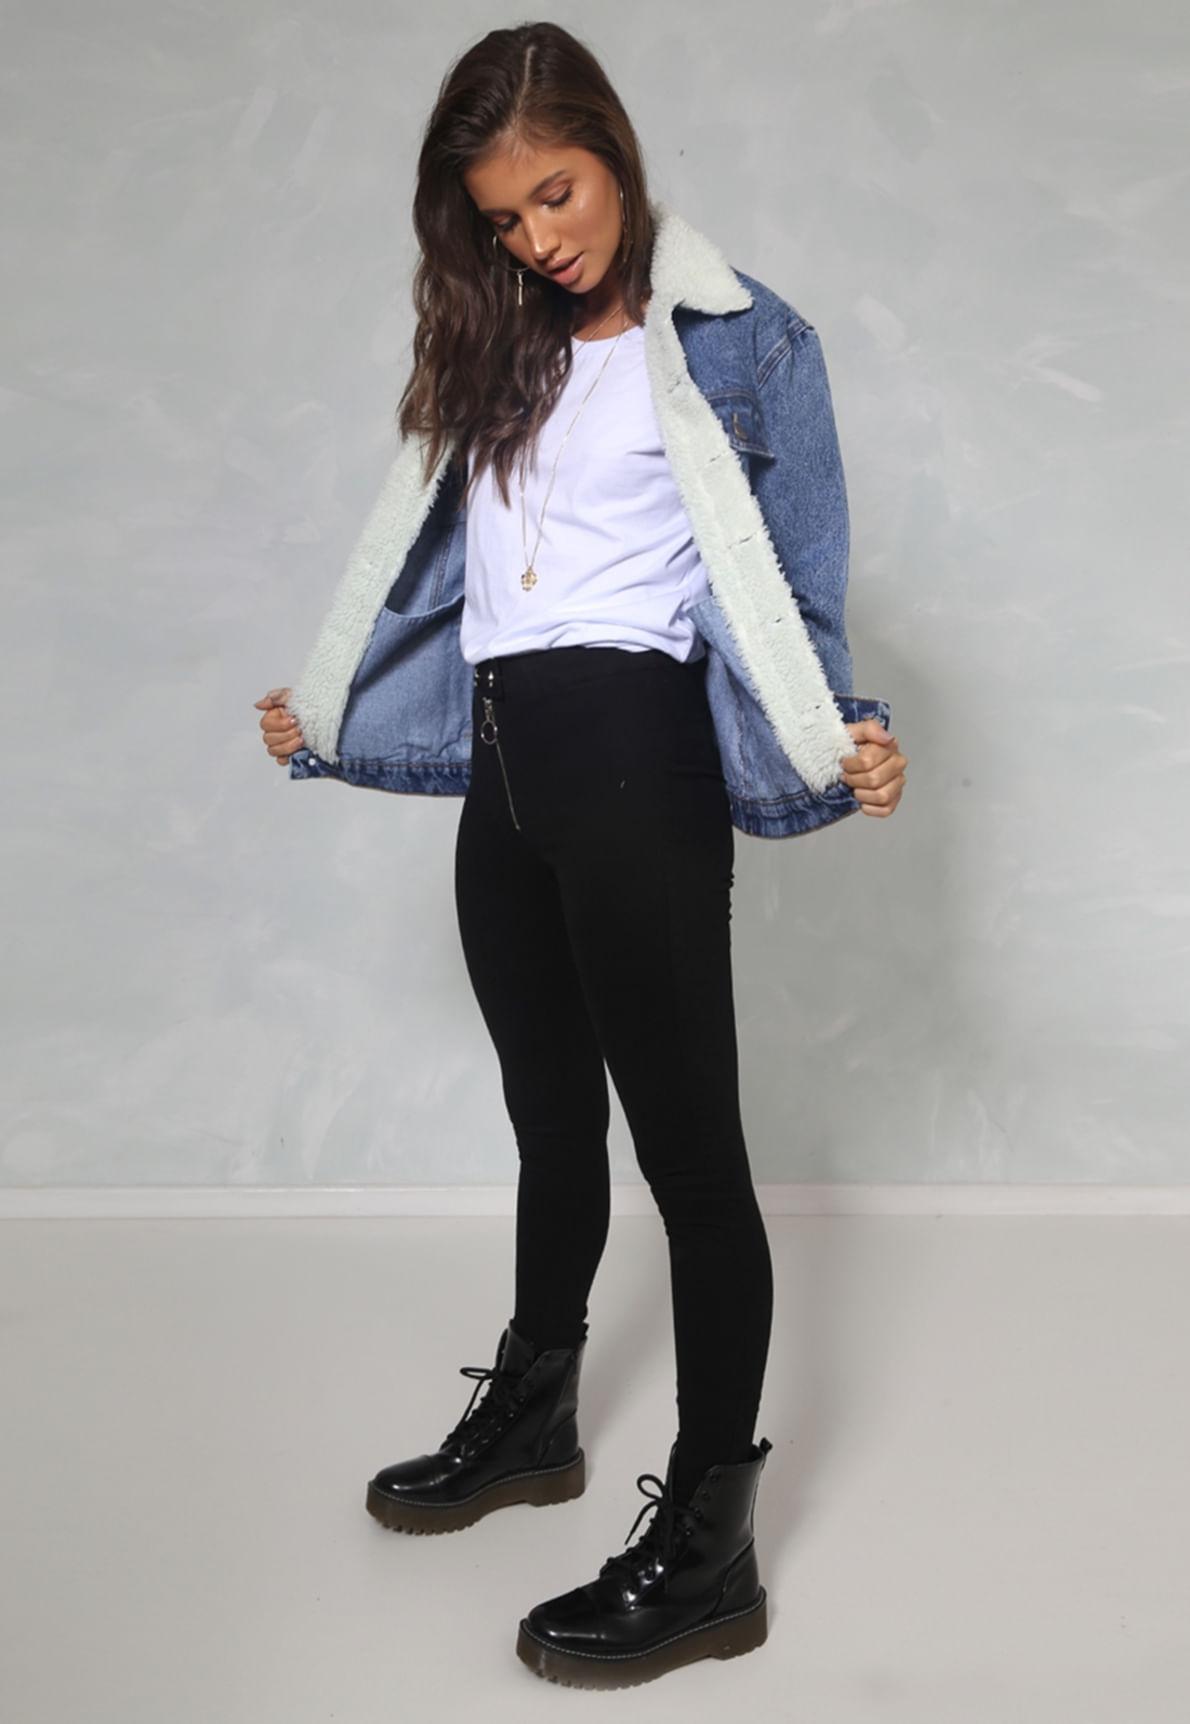 27276-jaqueta-jeans-pelinho-babygirl-mundo-lolita-03